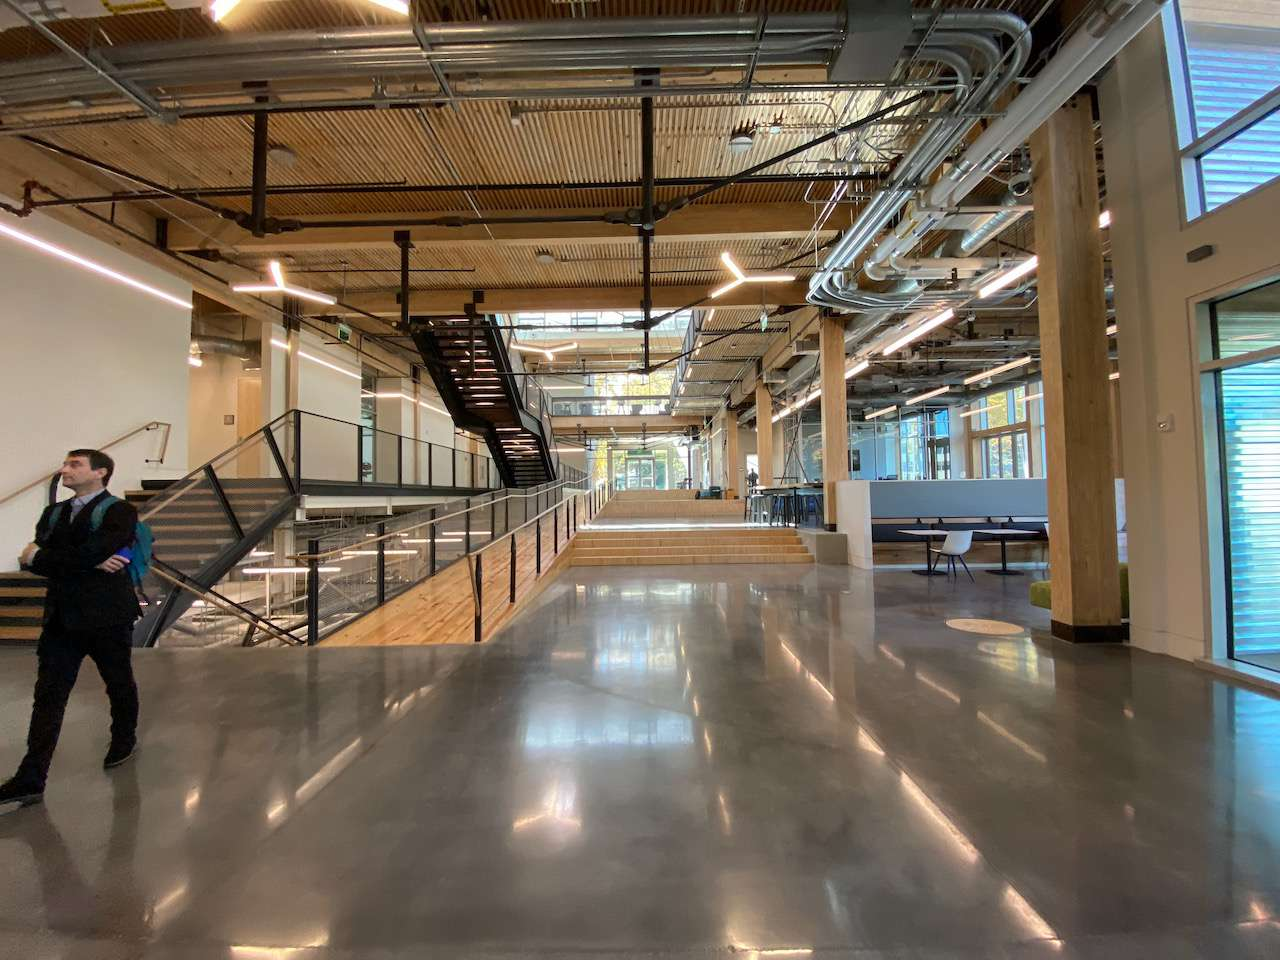 Interior ground floor with Corey